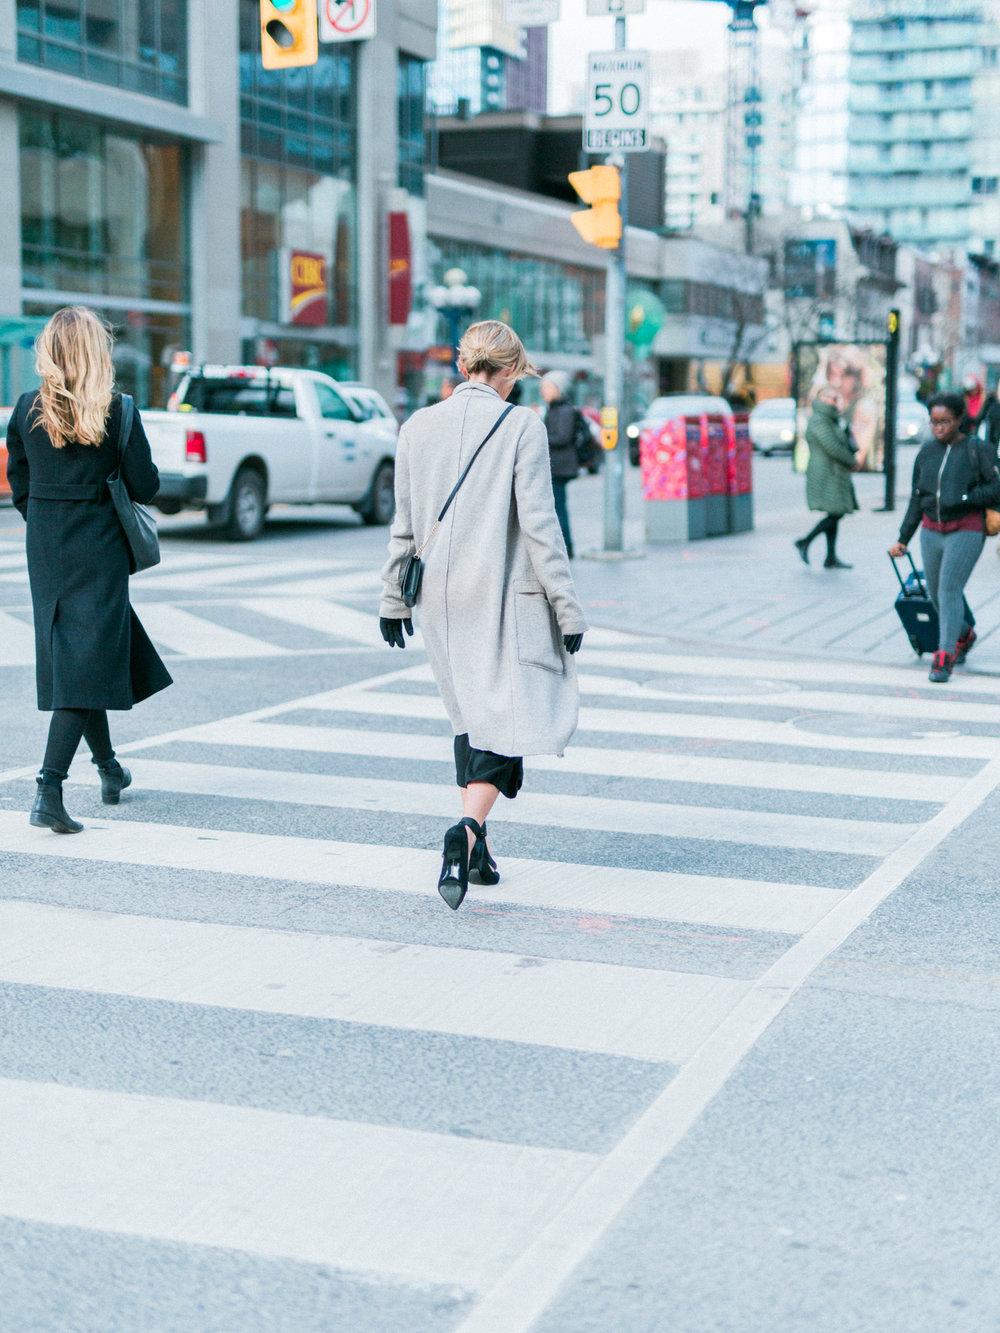 DanielleGirouxPhotography_Toronto_Portrait_StreetPhotography_0C6A1098.jpg